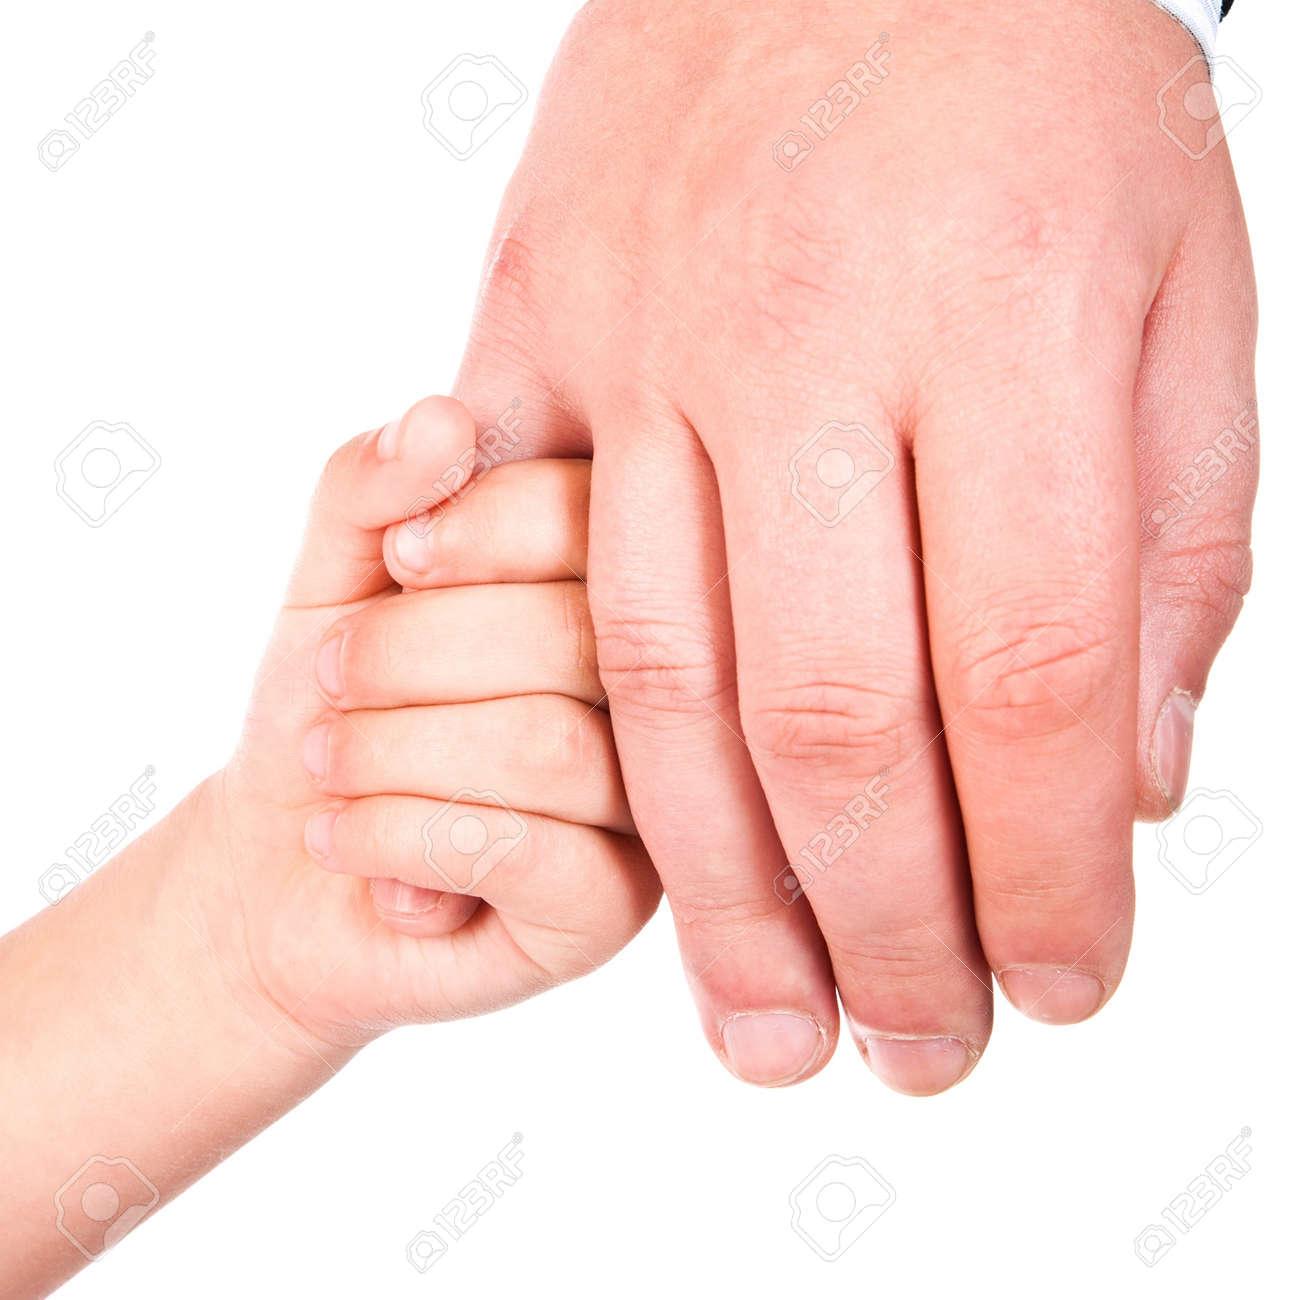 Фото рук мужчины и ребенка